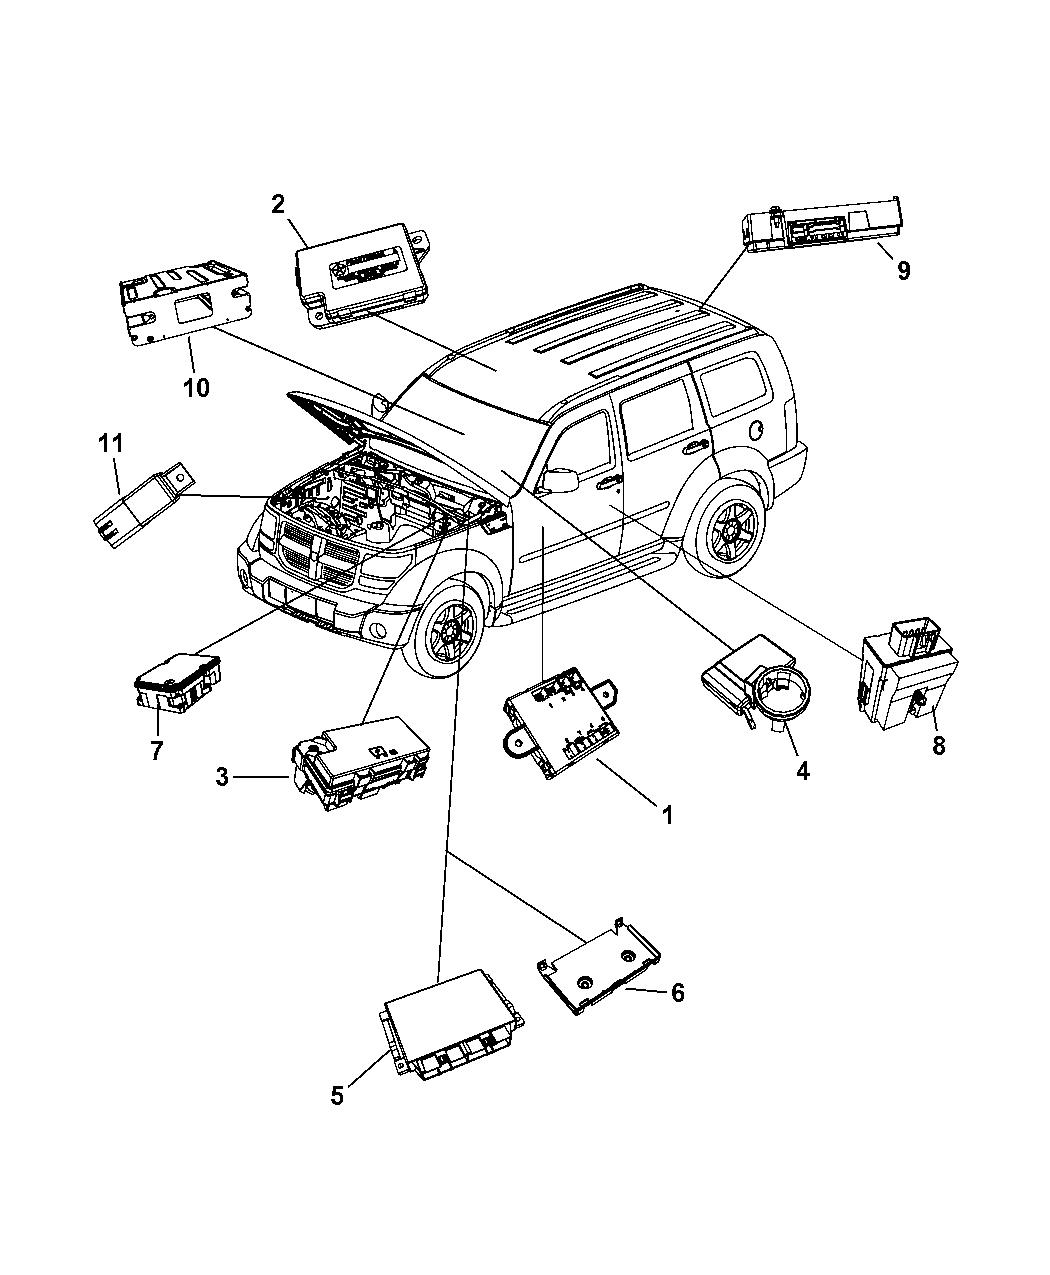 Dodge Nitro Blend Door Location Get Free Image About Wiring Diagram